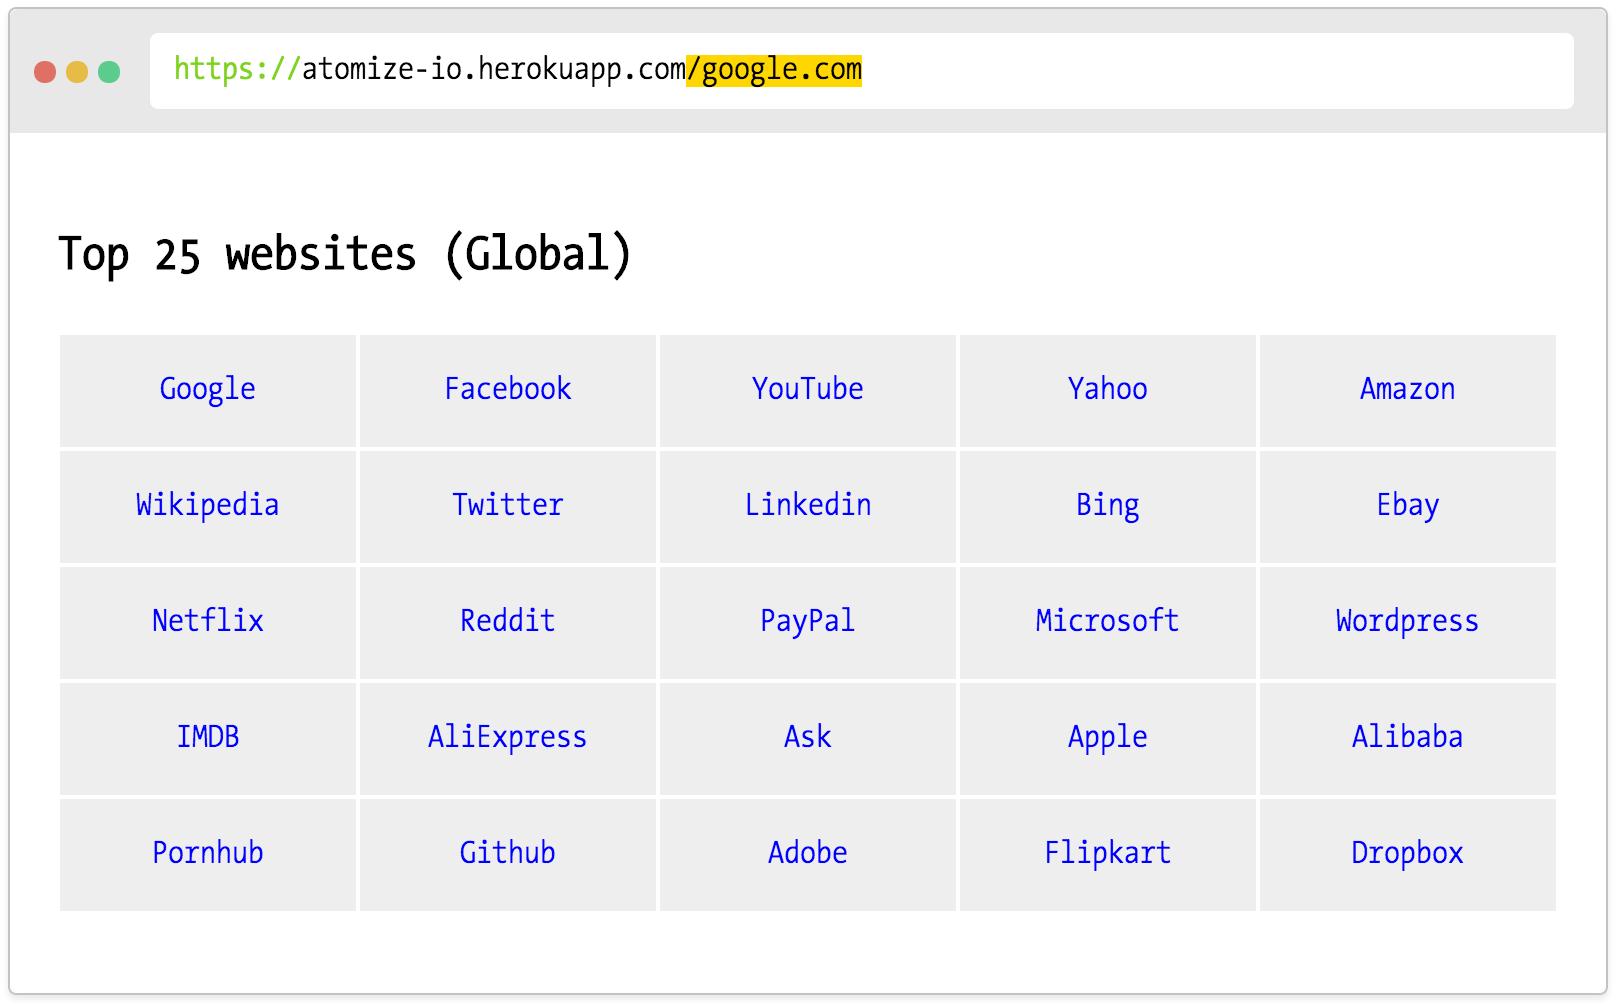 Screenshot for Codelab in action